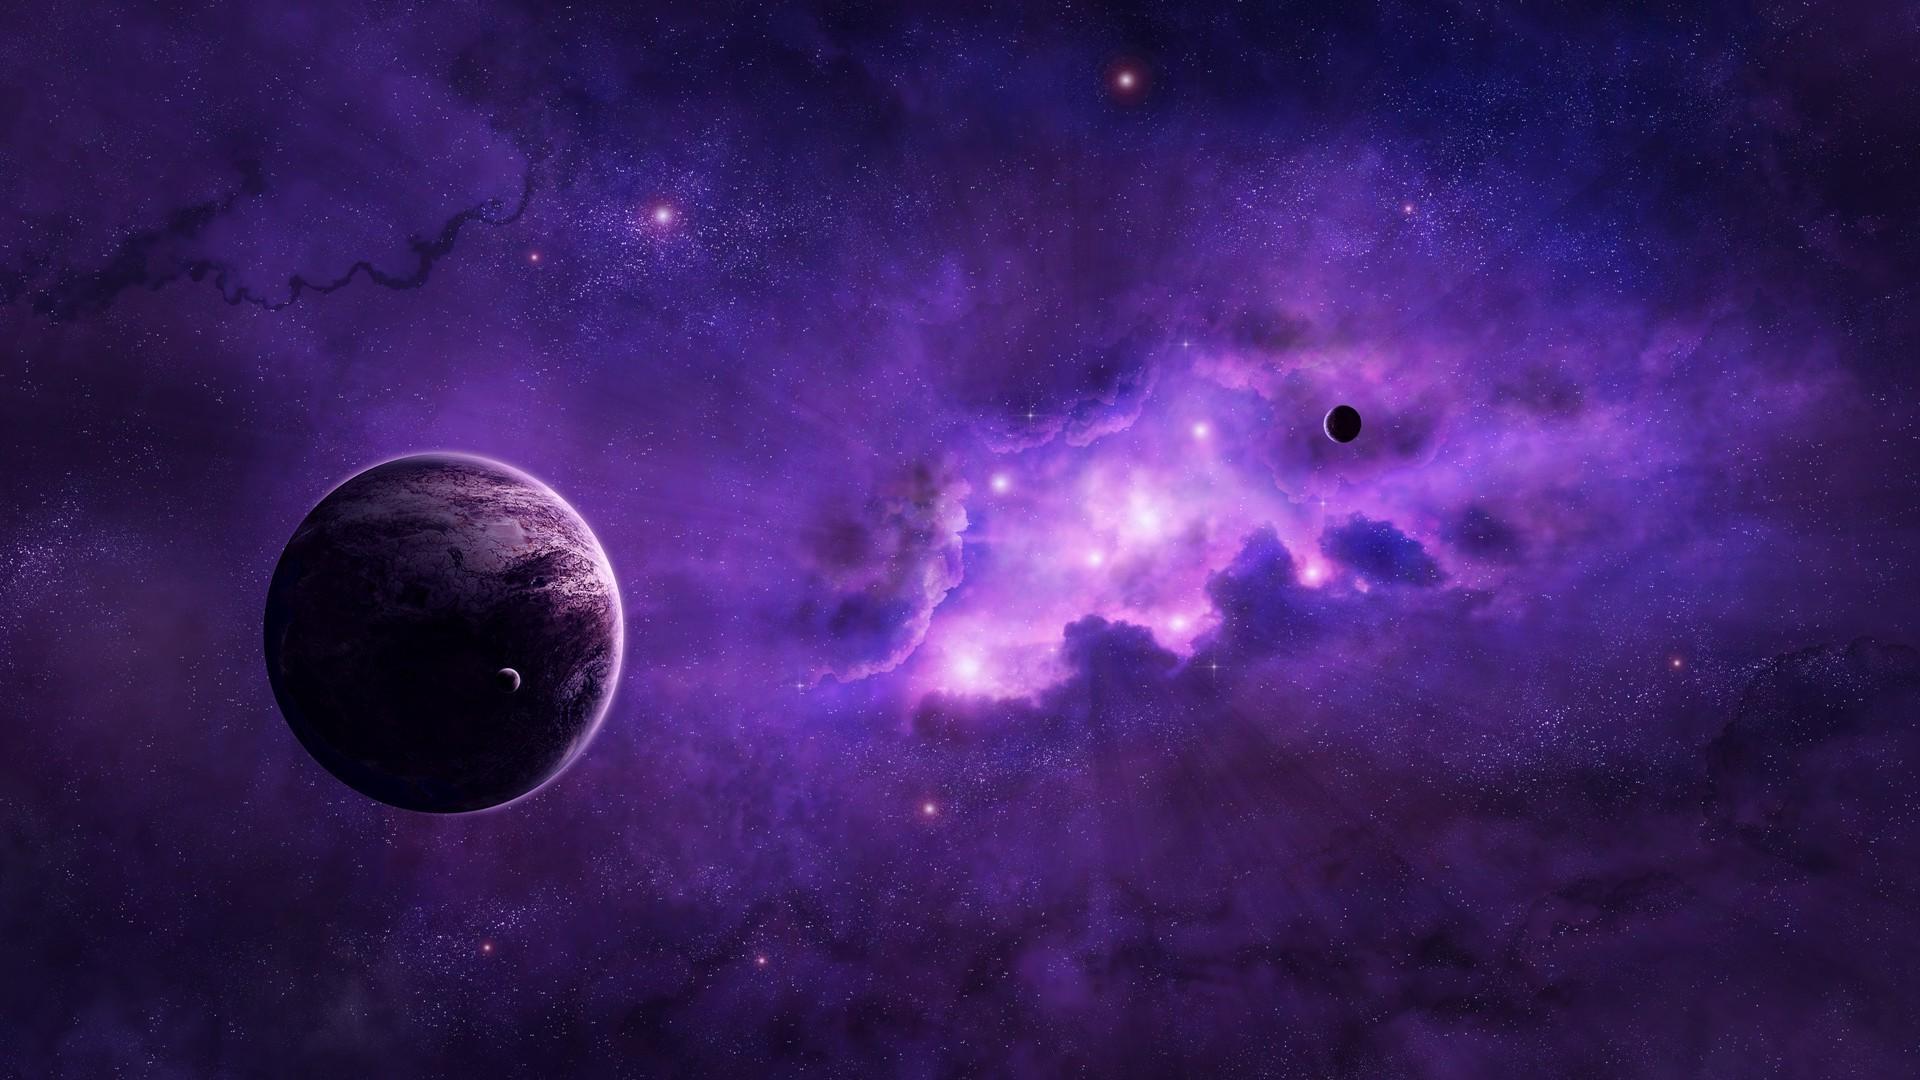 Wallpaper 1920x1080 Px Planet Purple Space Art